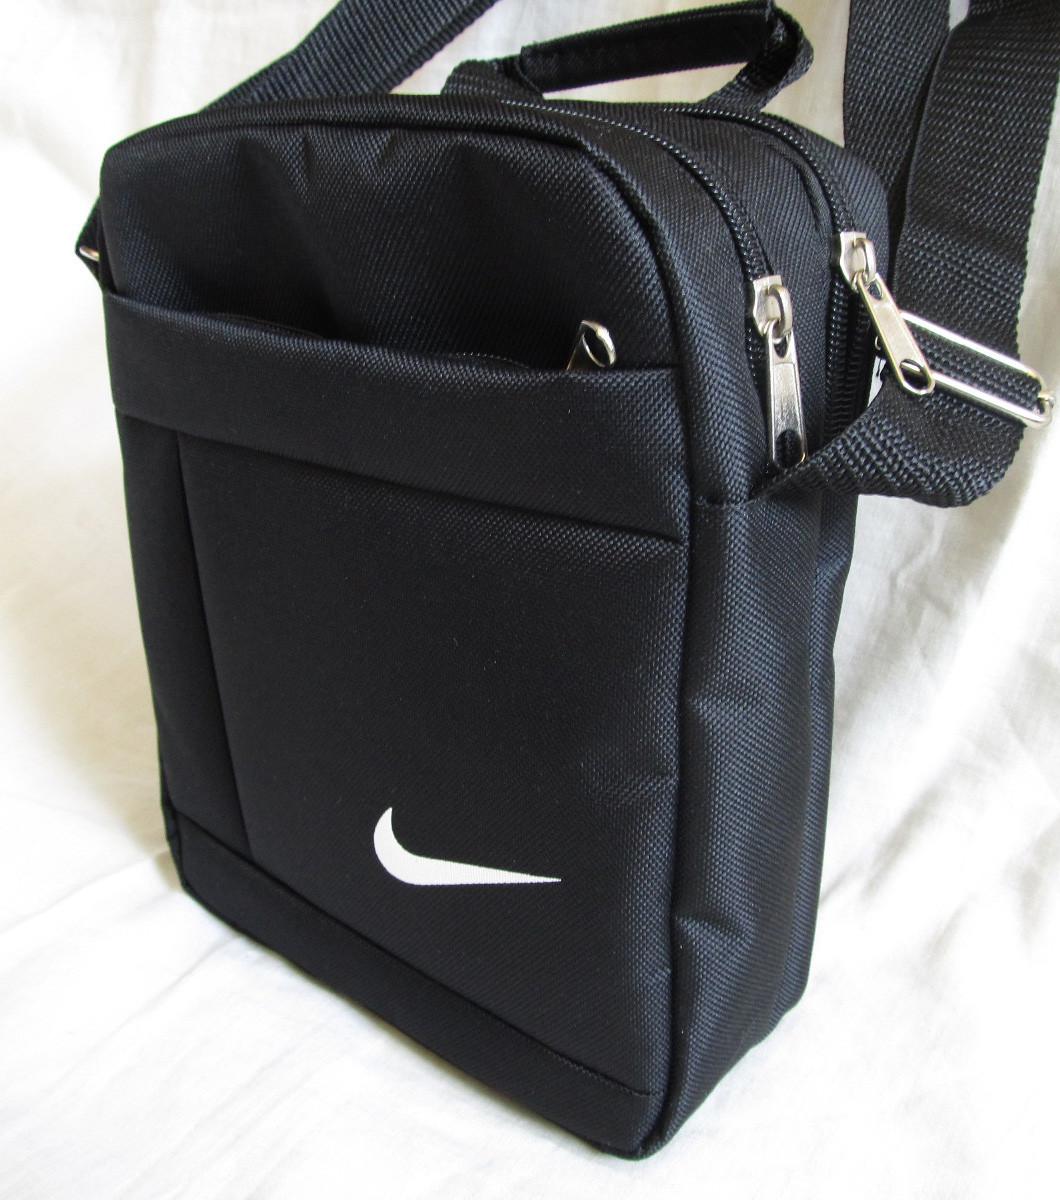 25e4f1ebe7a8 Мужская сумка через плечо спортивная барсетка черная 23х19х8см ...